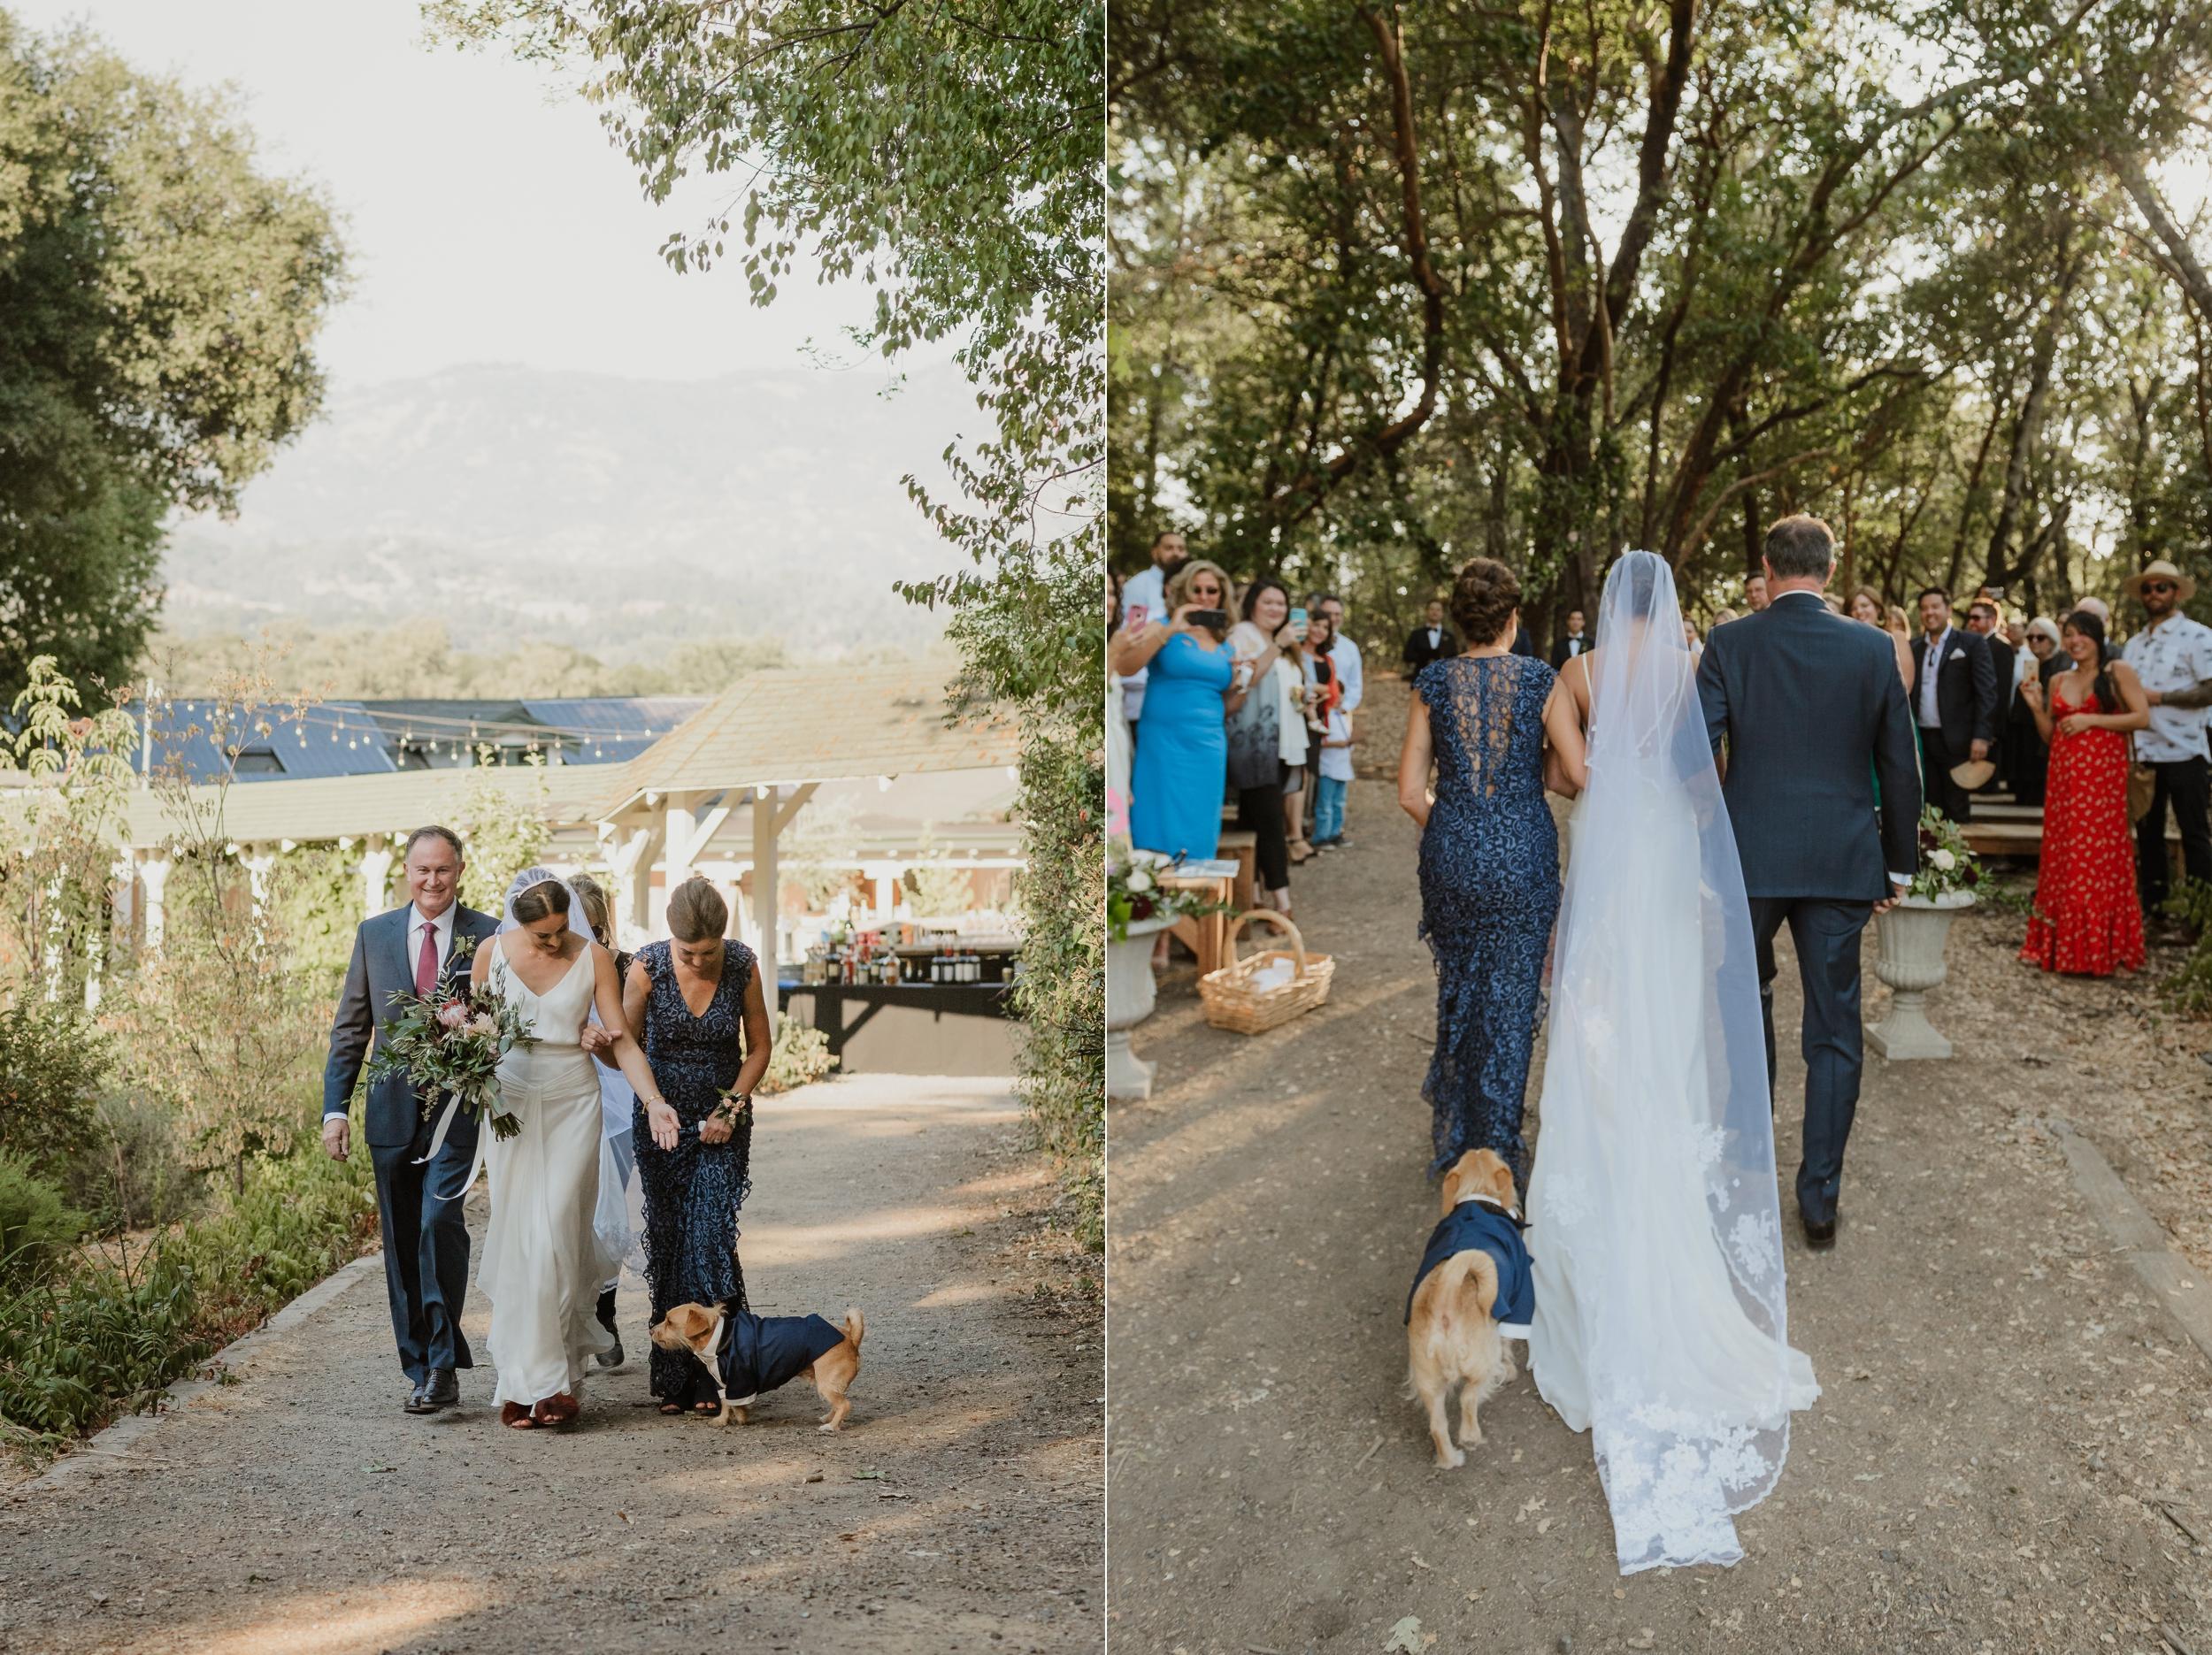 32-ukiah-yokayo-ranch-fall-wedding-vivianchen-212_WEB.jpg